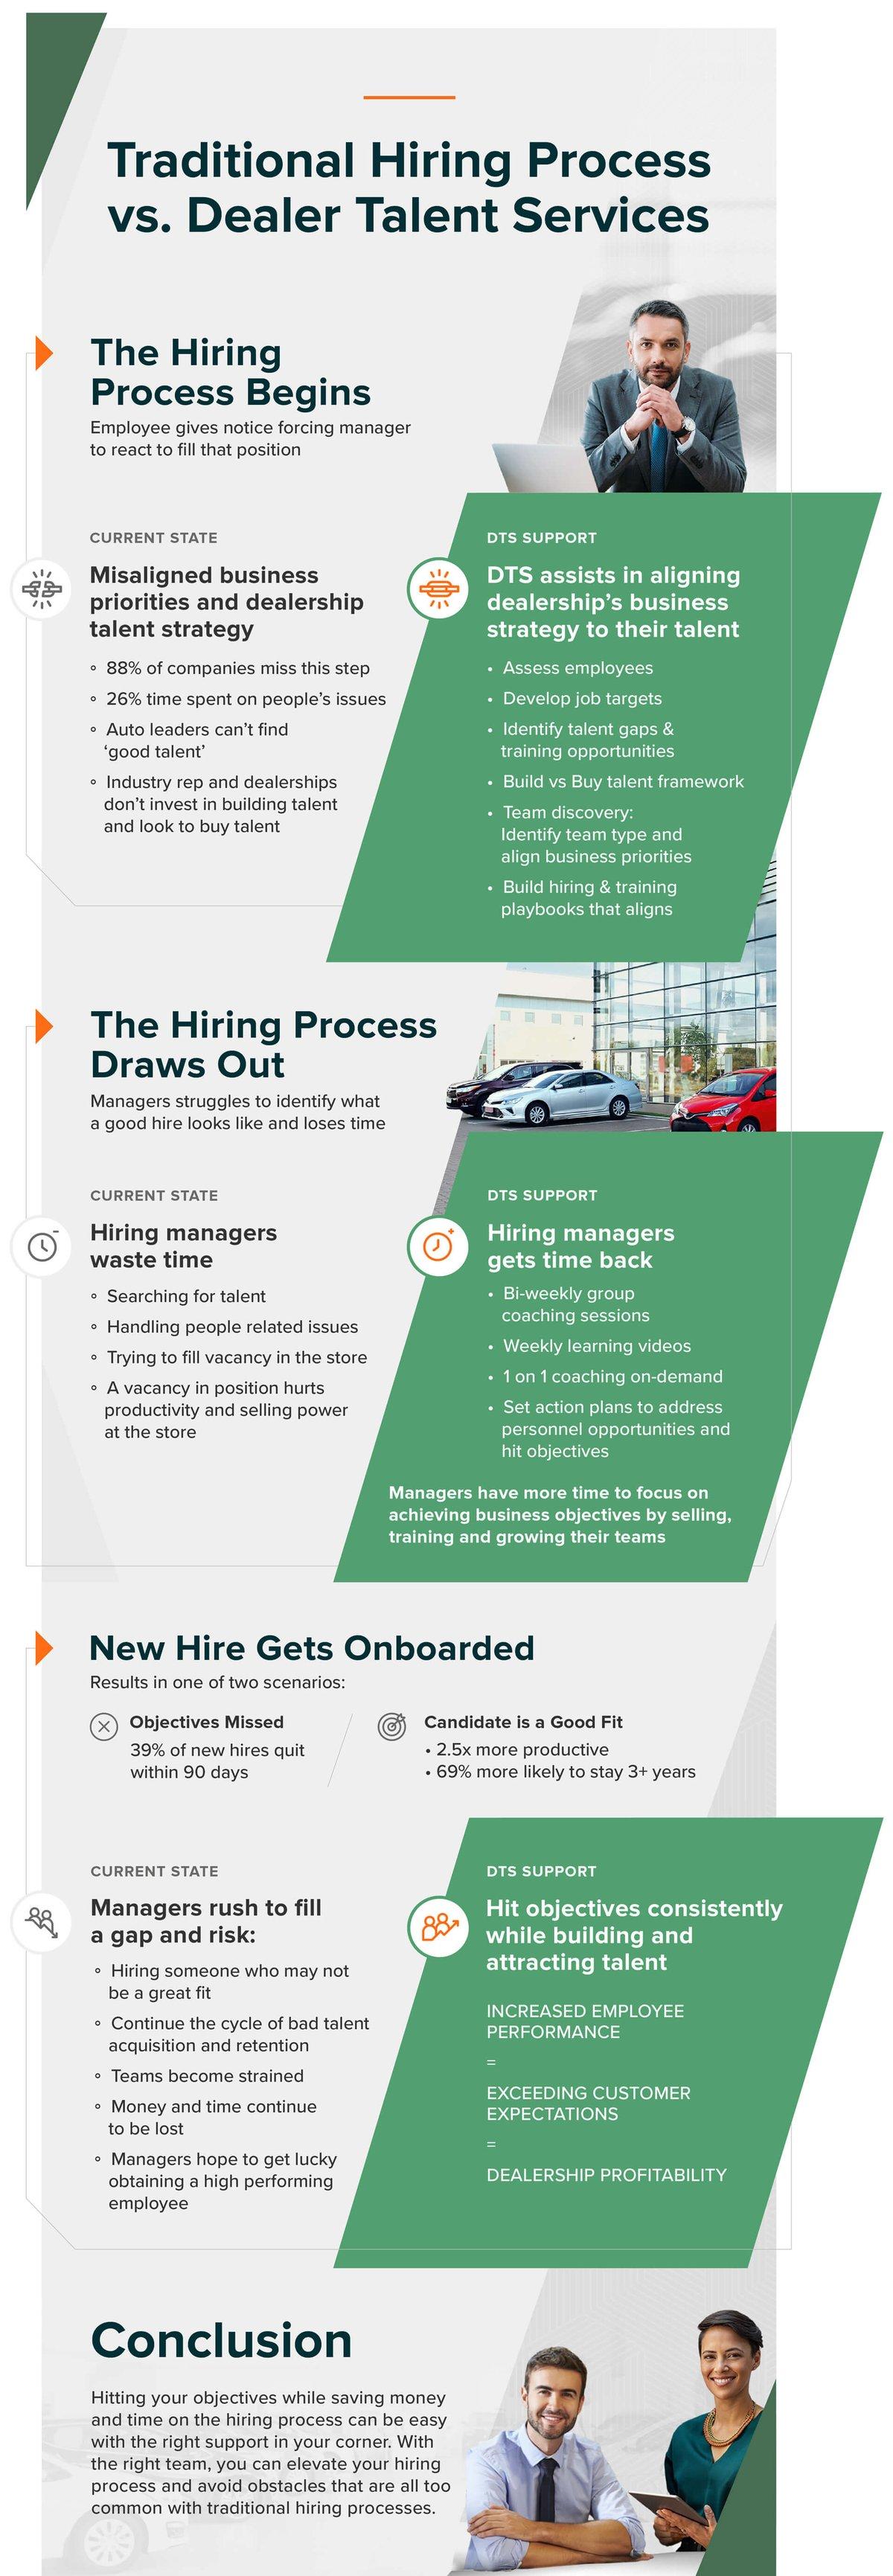 Traditional Hiring Process vs. Dealer Talent Services